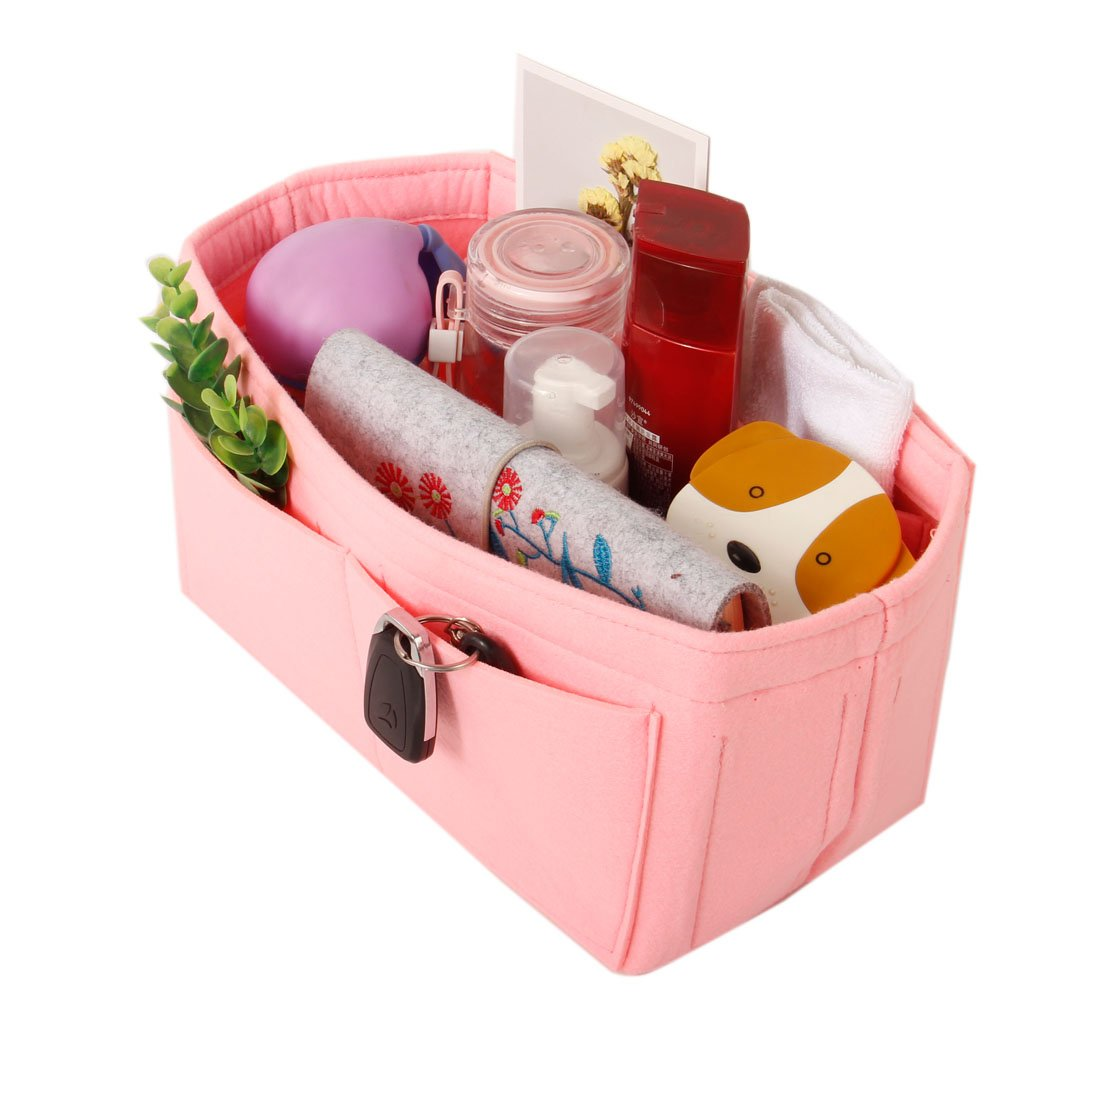 Felt wallet inserted into organizer bag (M, pink)